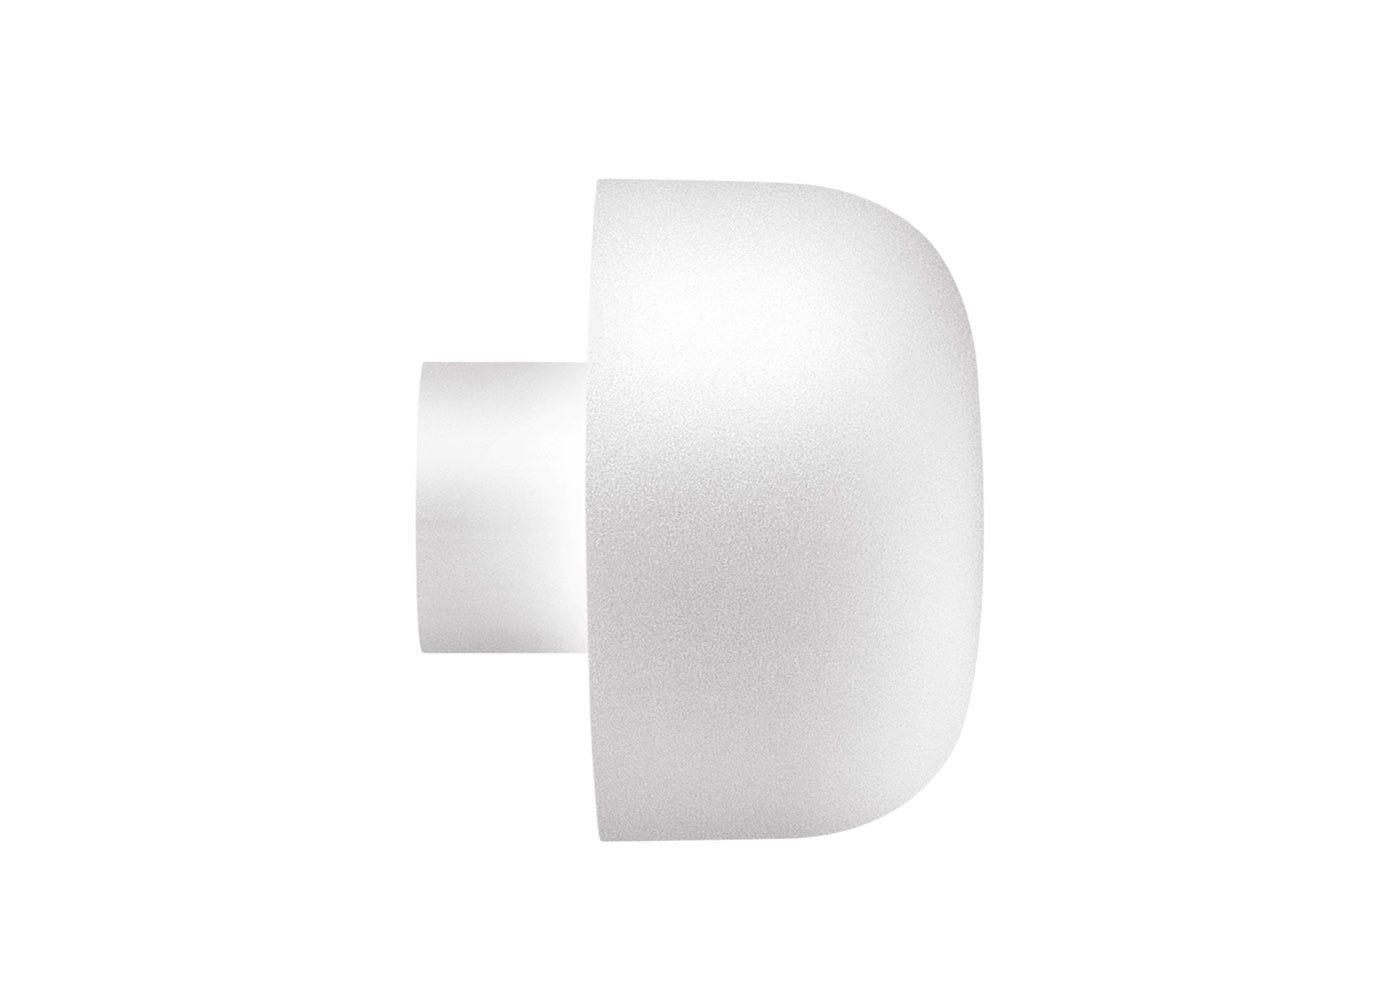 As Shown: Bellhop Wall Light White.